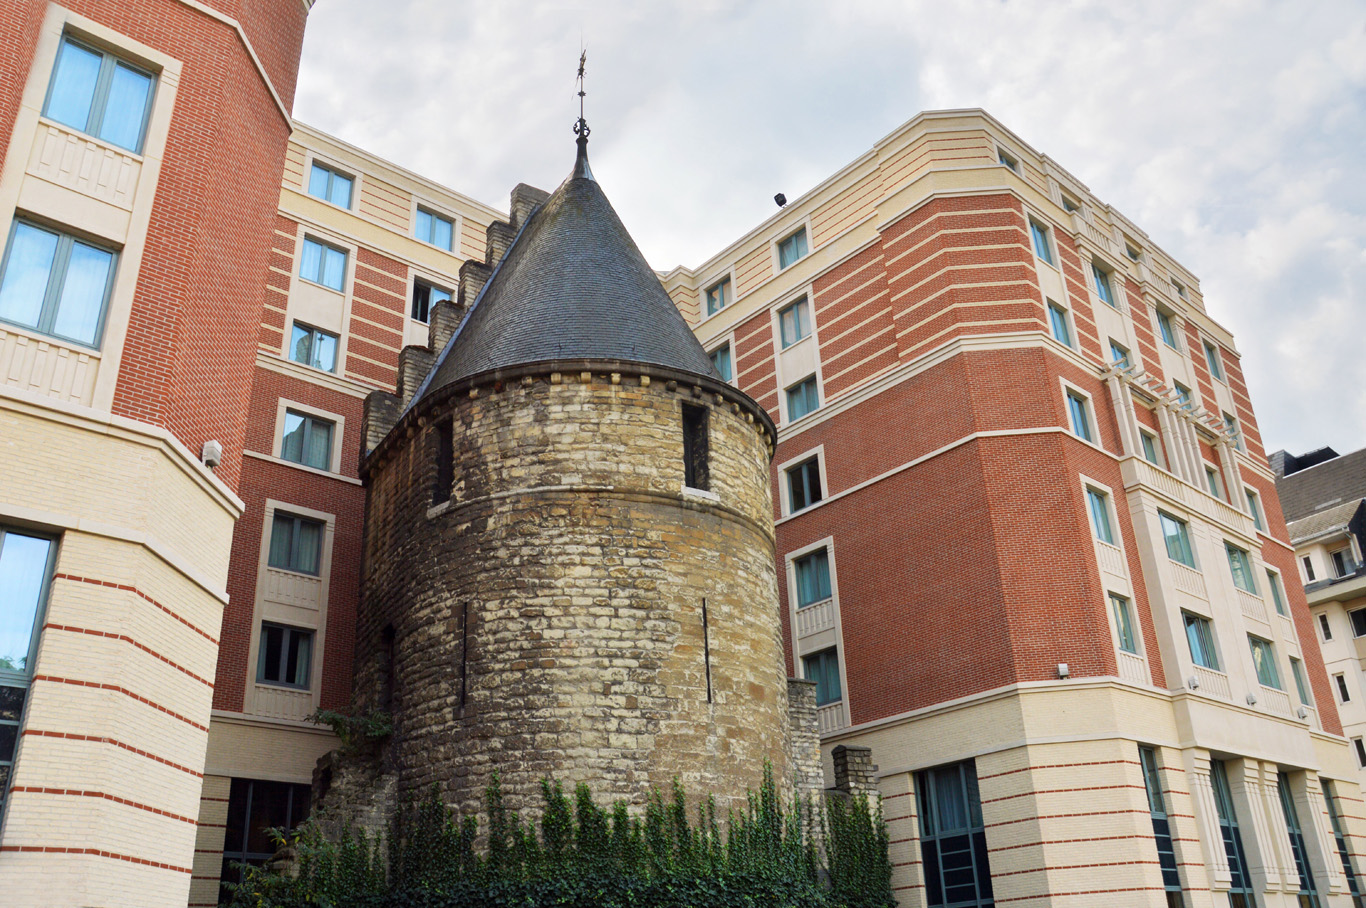 Zwarte toren (tower)